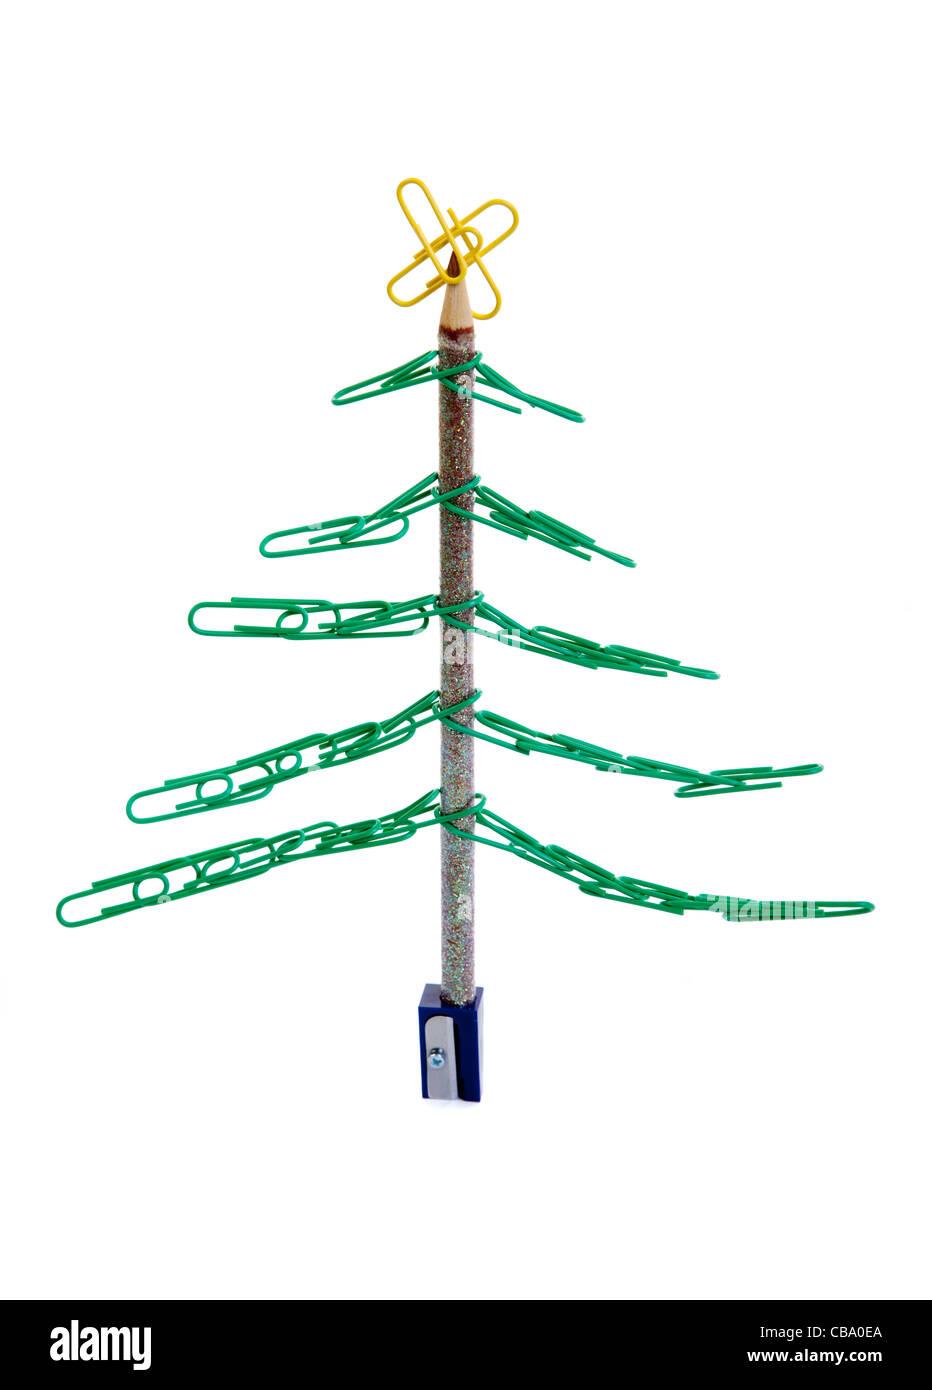 c8alamycomcompcba0eaoffice christmas tree mad - Christmas Tree Clips